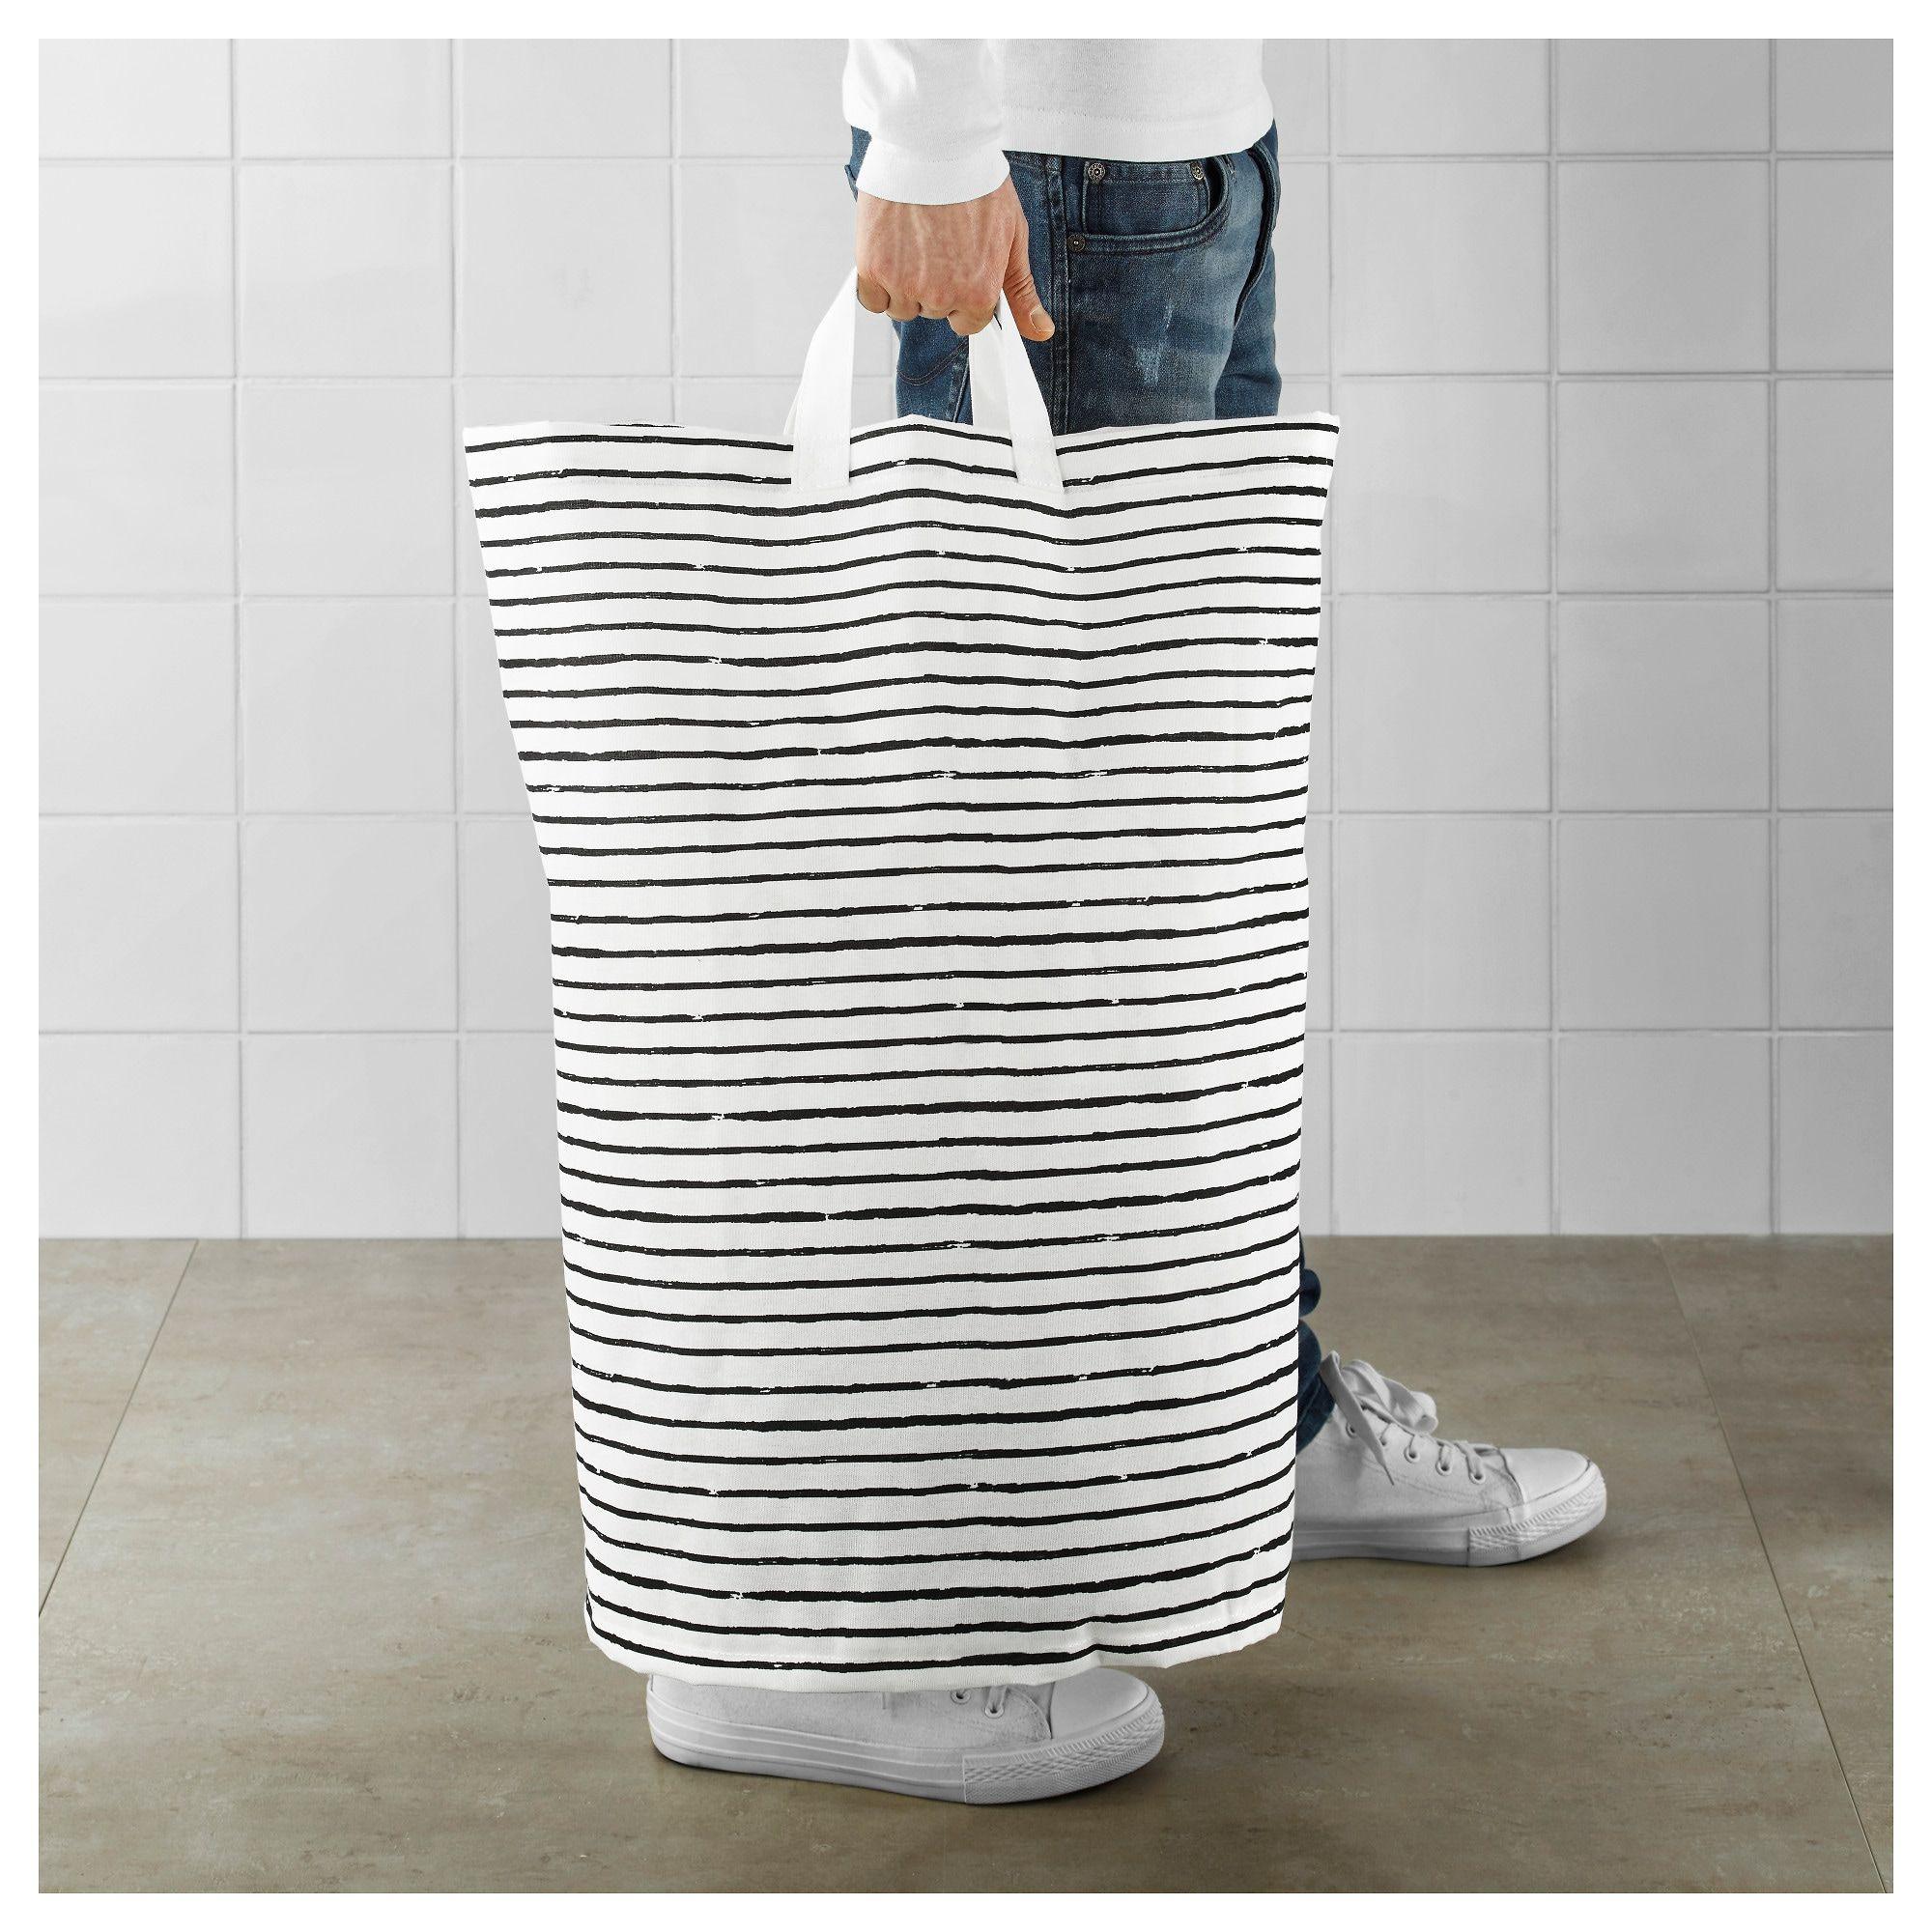 Ikea Klunka White Black Laundry Bag In 2020 Ikea Laundry Ikea